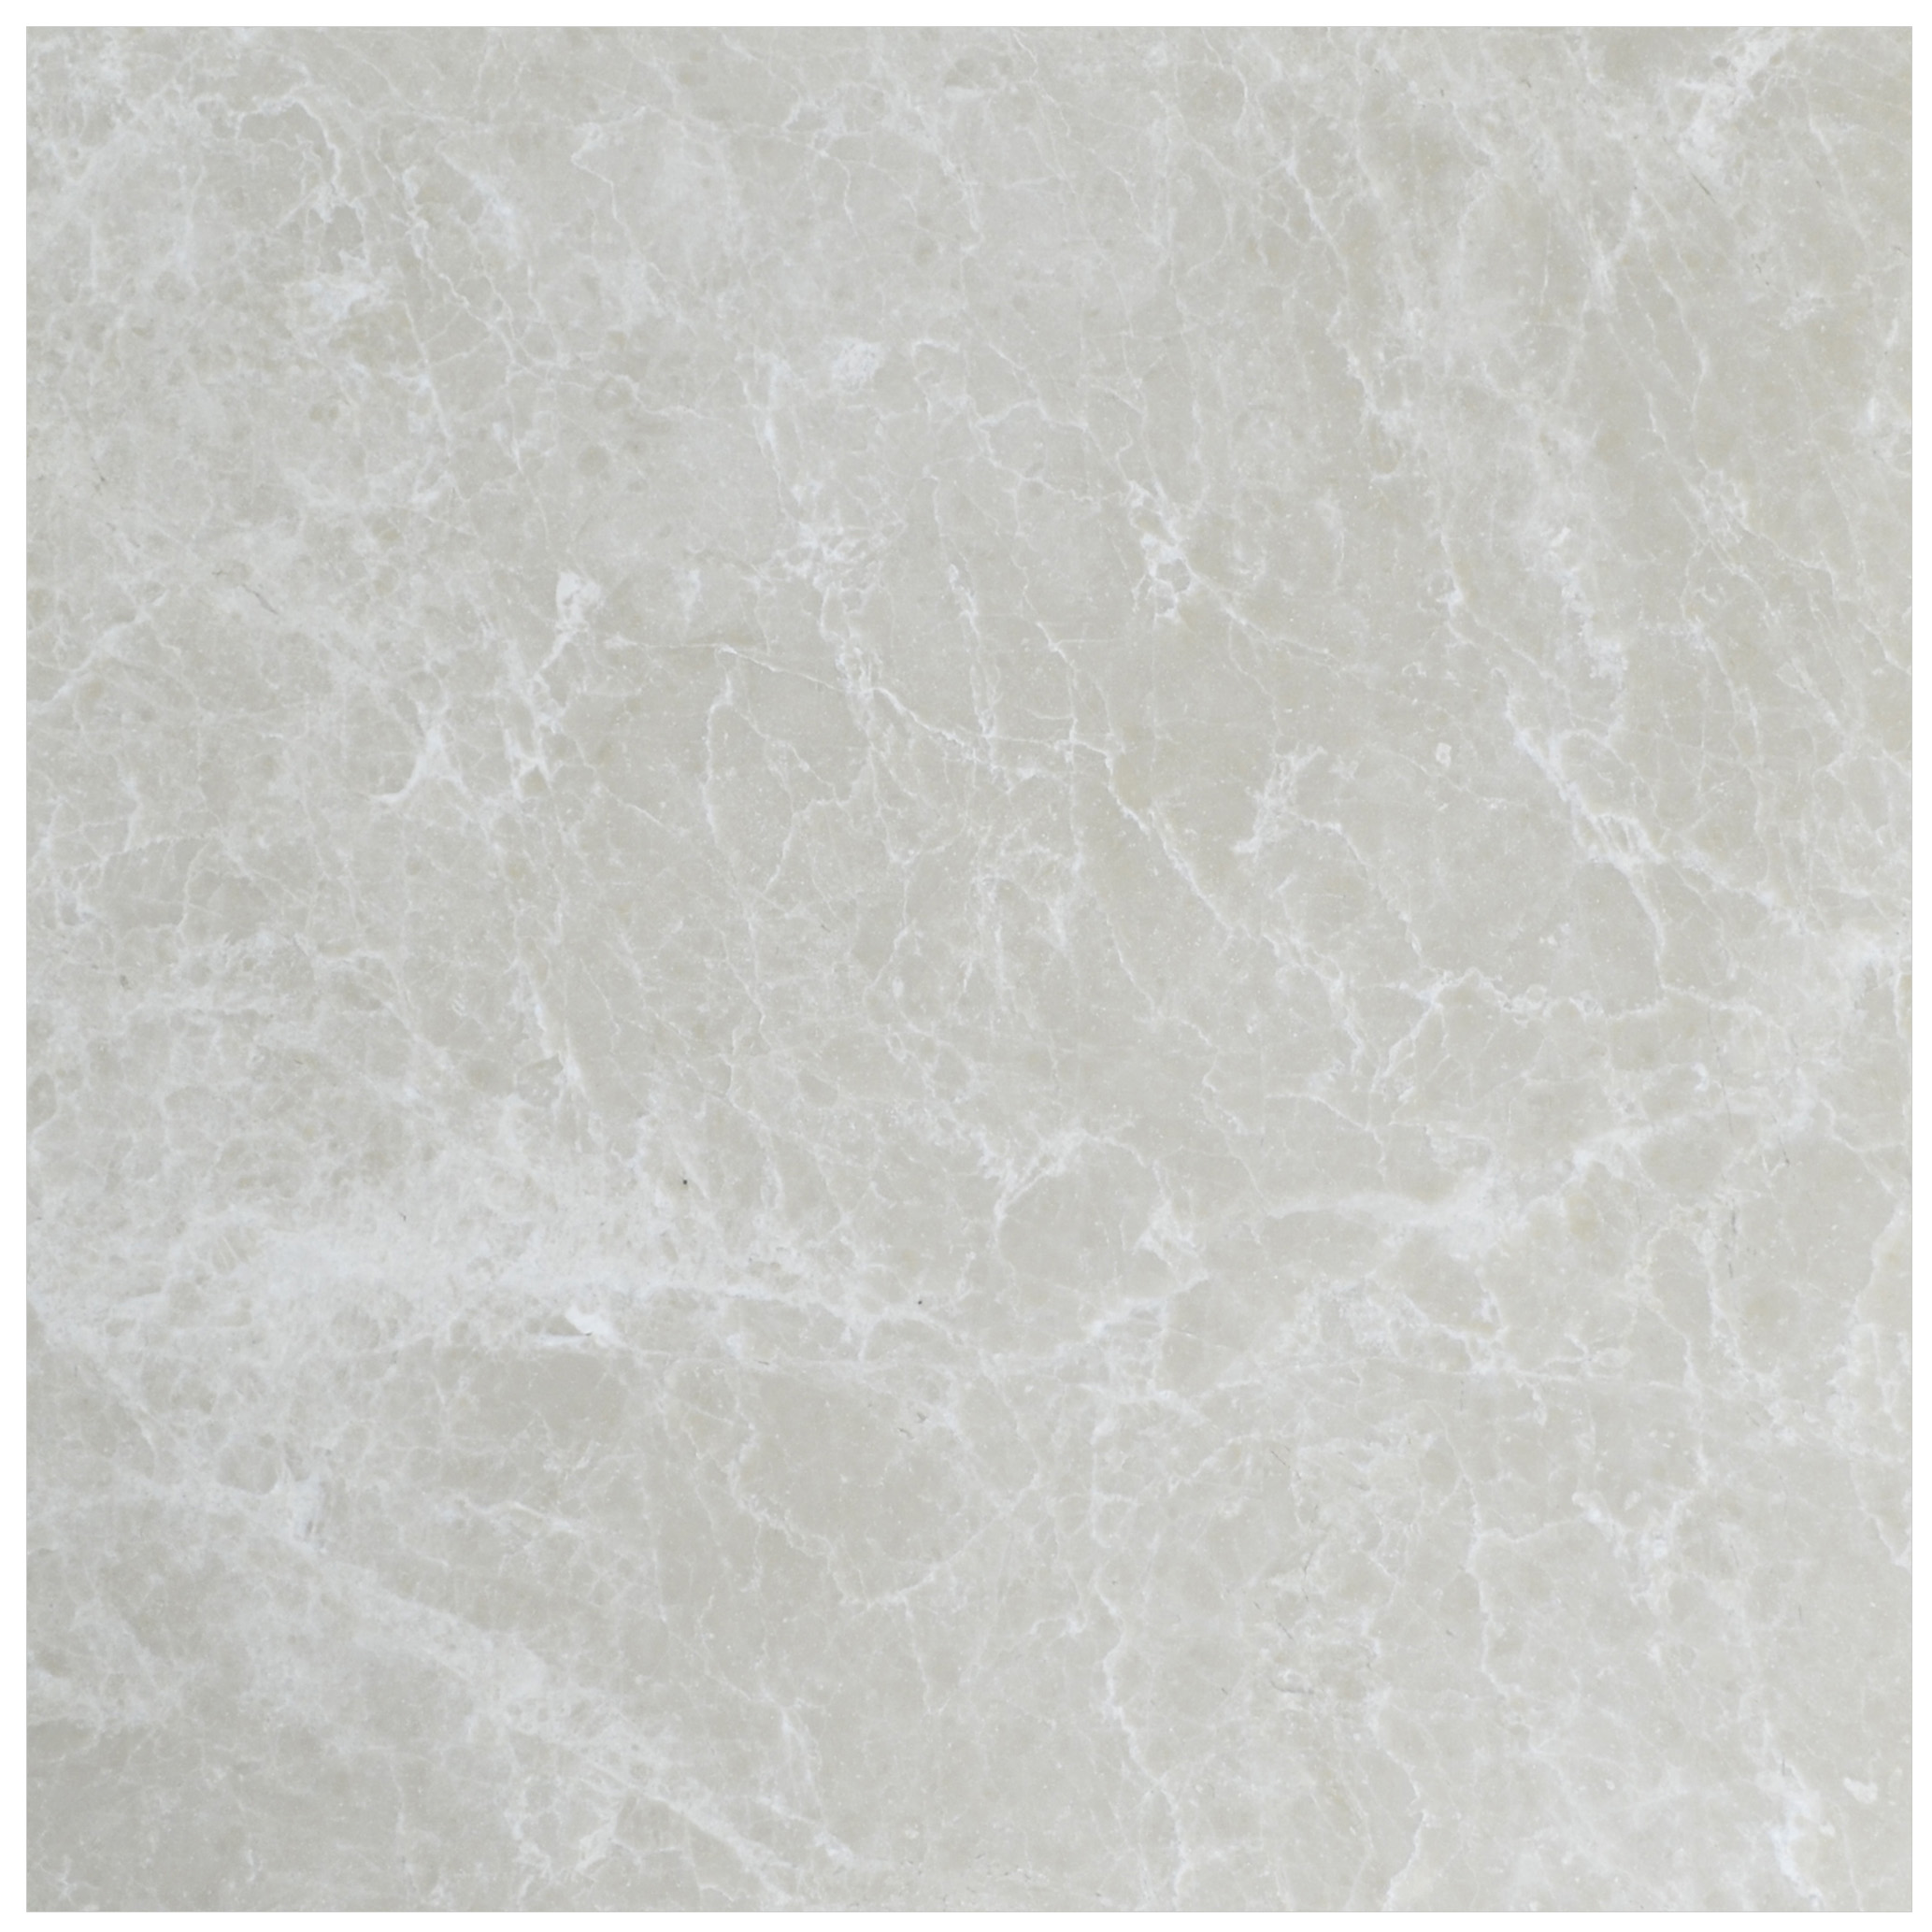 Botticino Antique Marble Tiles 18x18 2